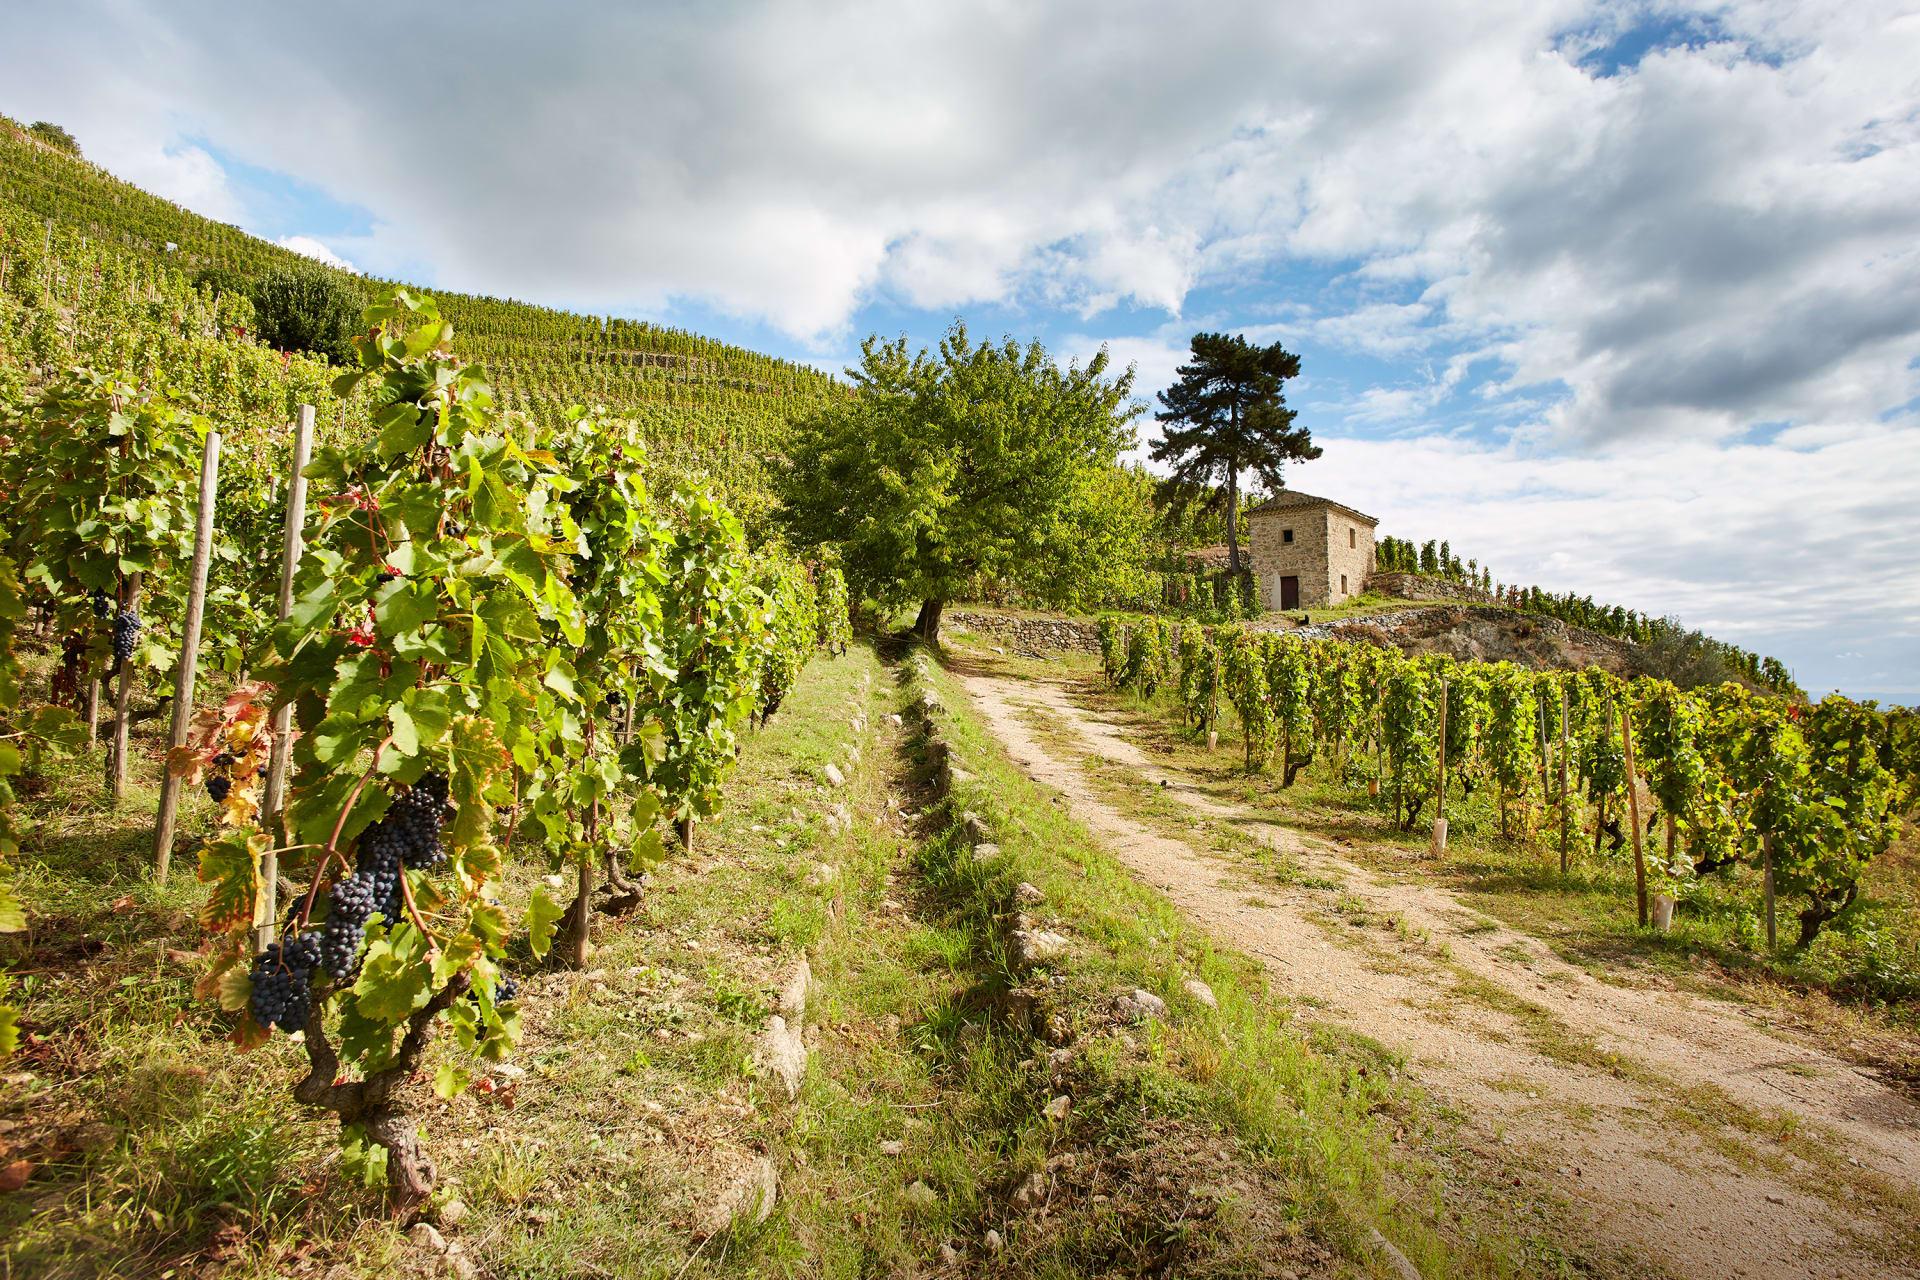 Syrah Fall Wine - Saint, Joseph France